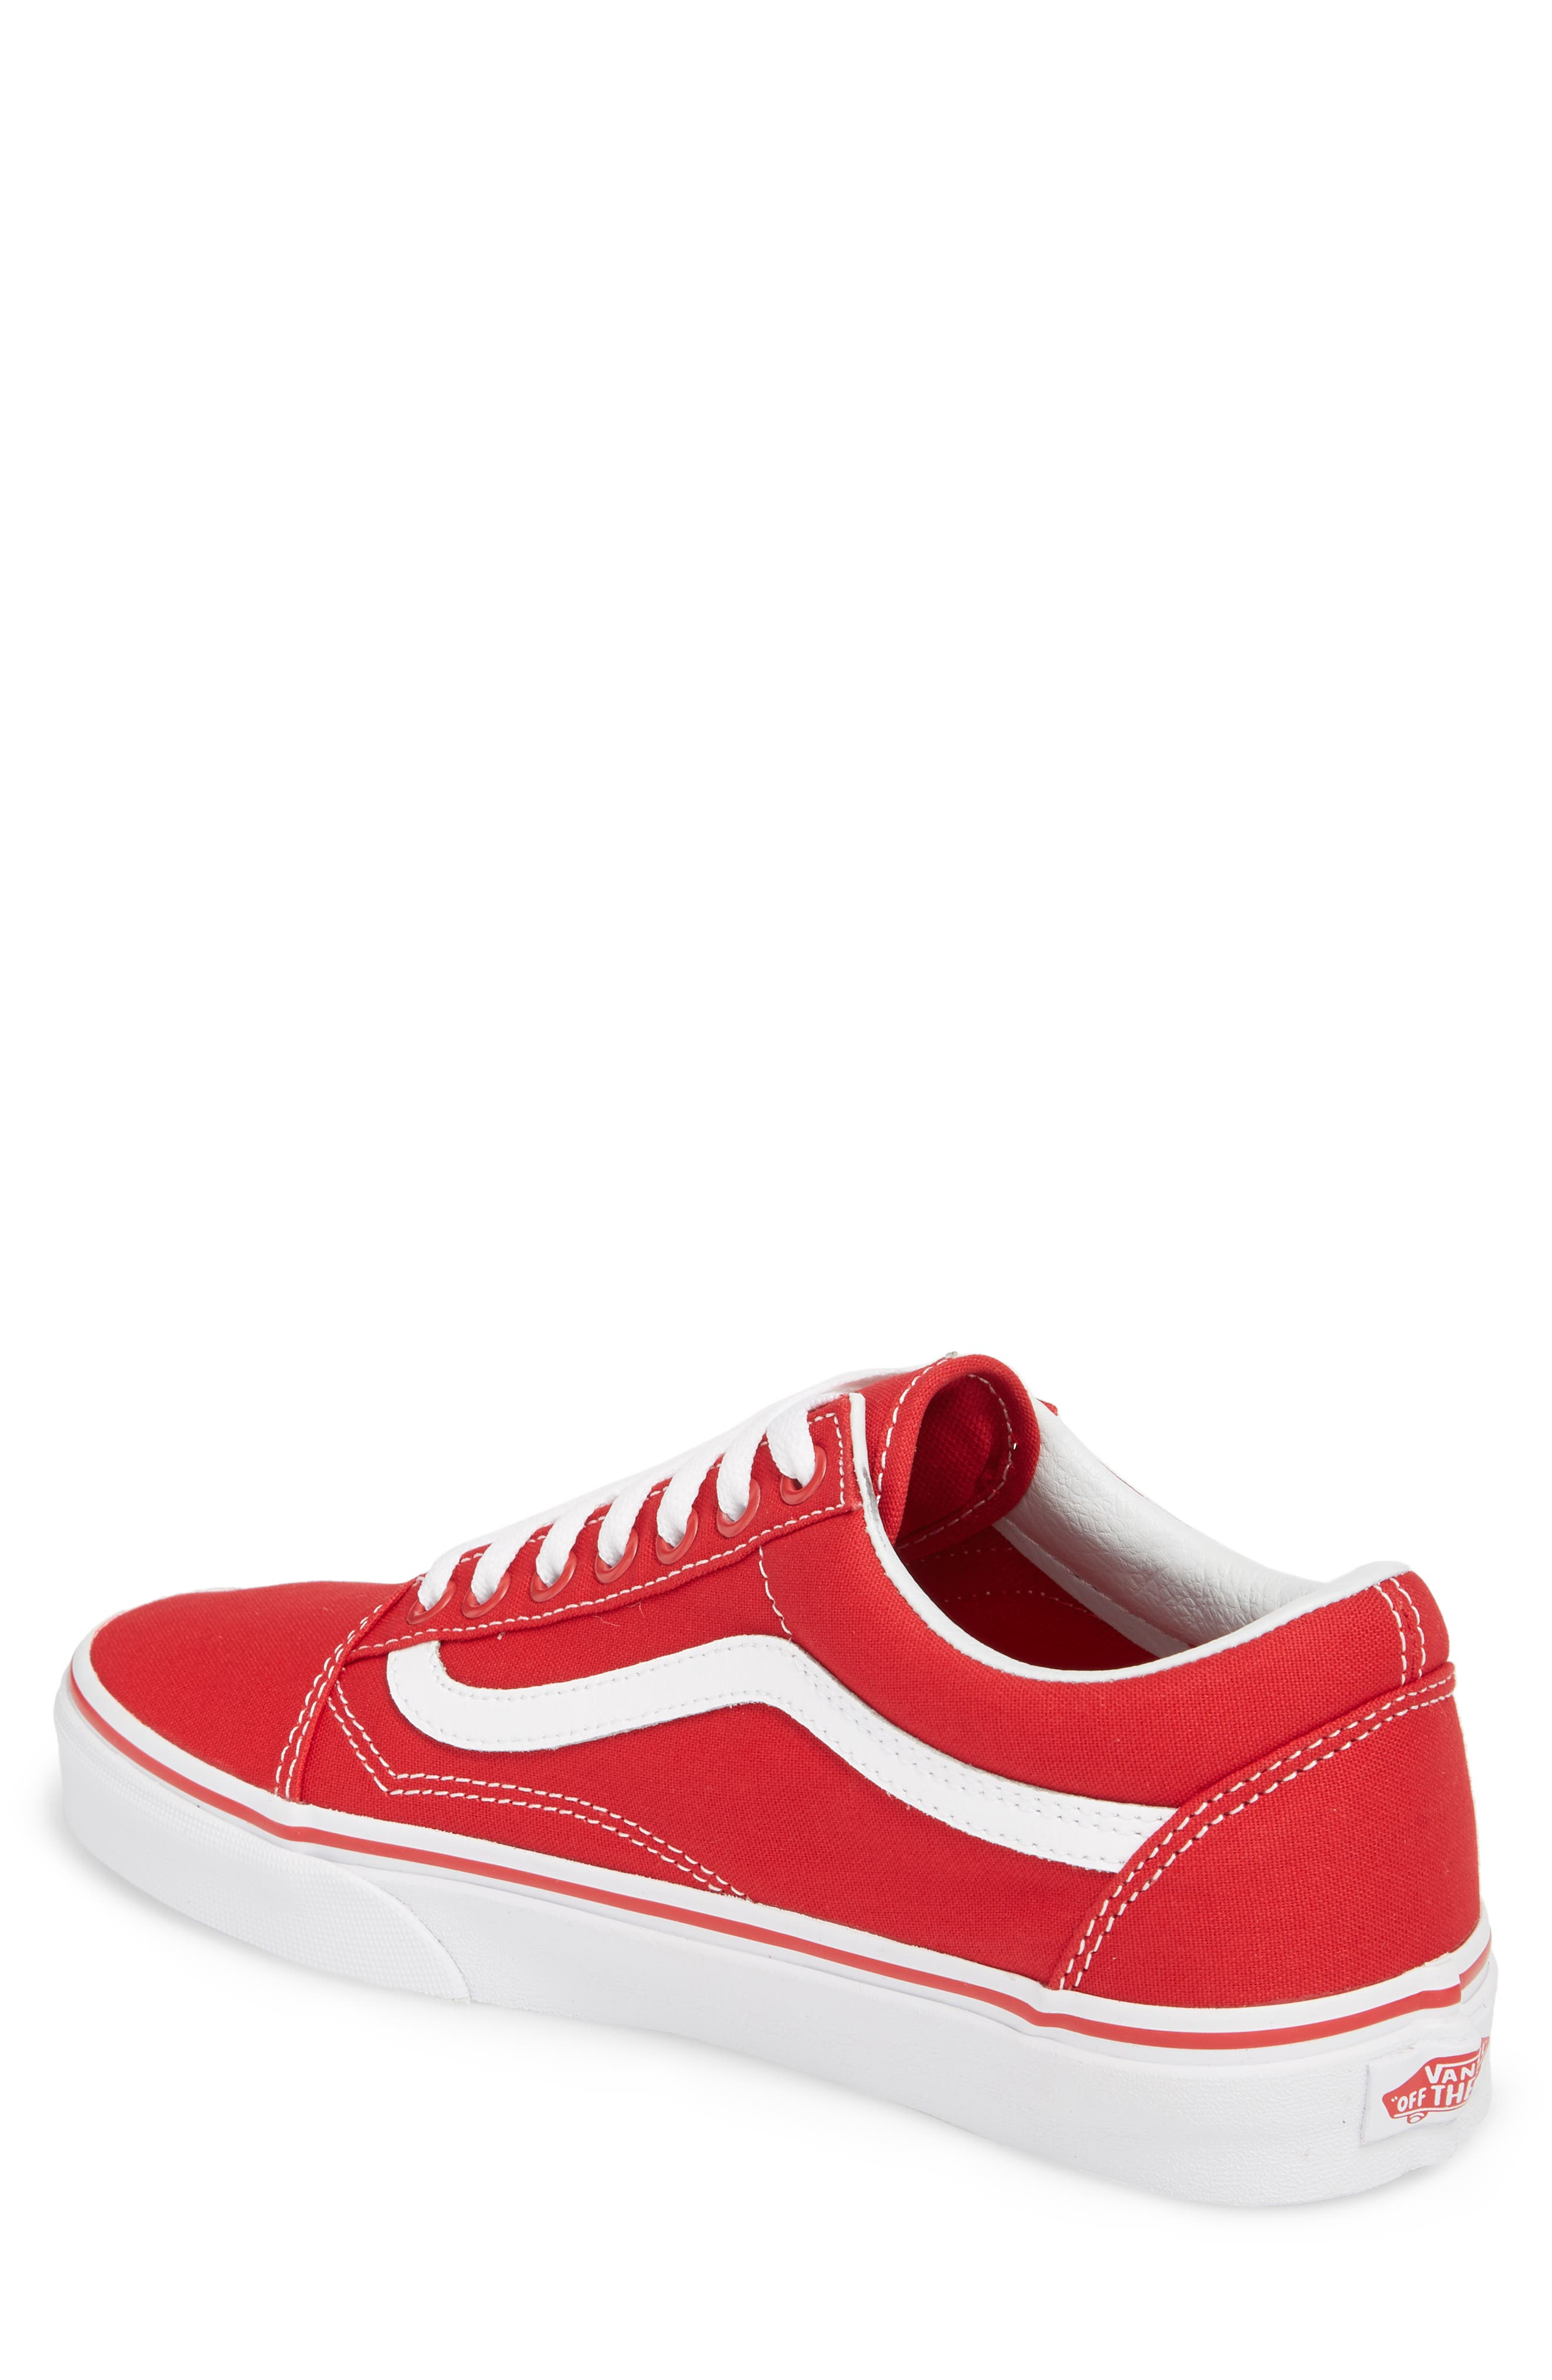 Old Skool Low Top Sneaker,                             Alternate thumbnail 2, color,                             Formula One Canvas